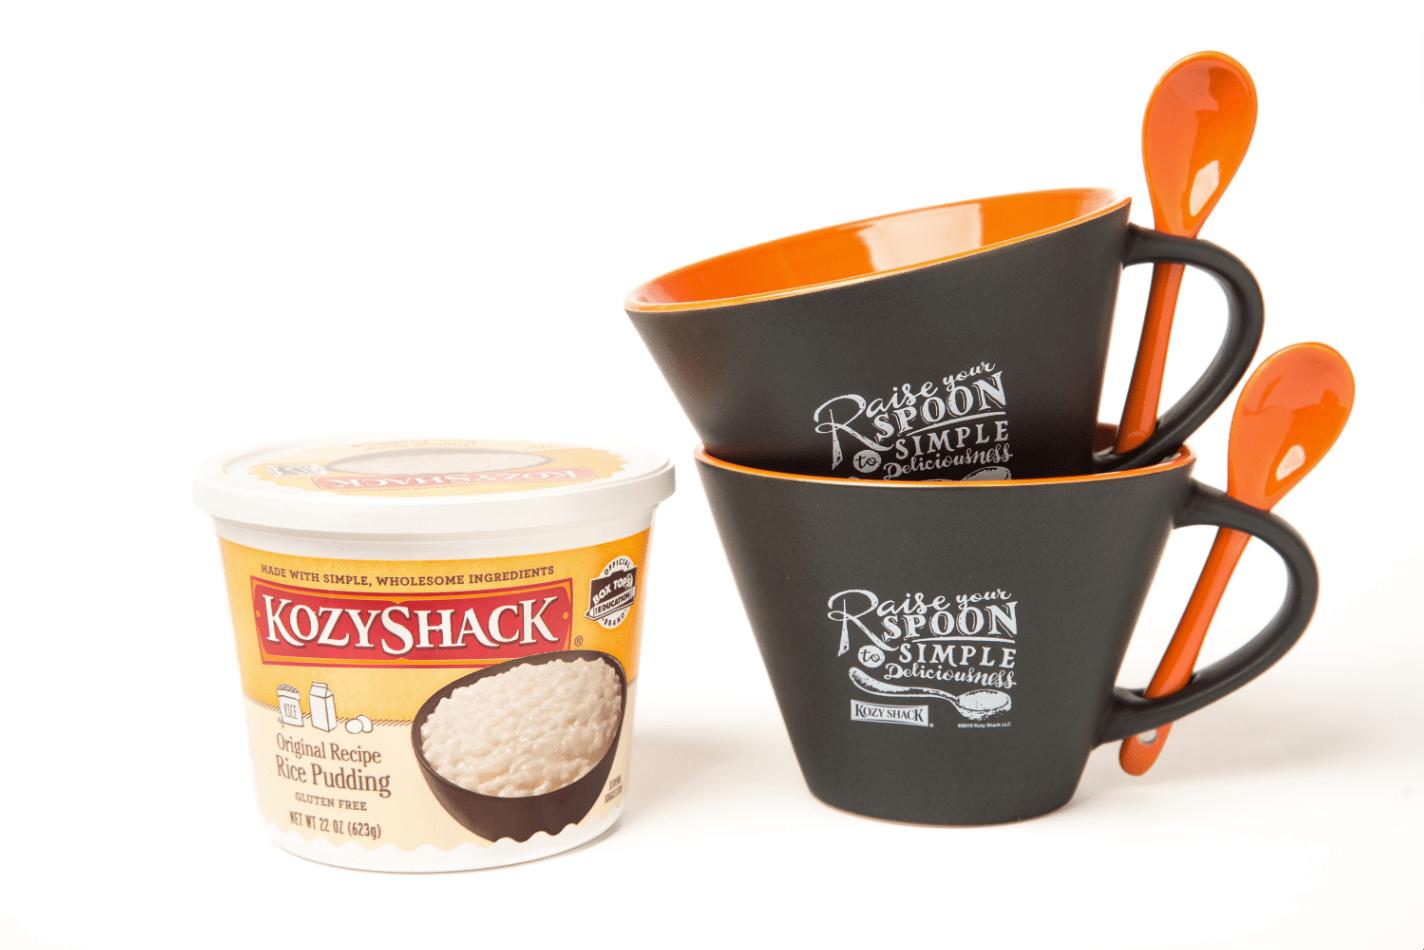 kozy shack giveaway